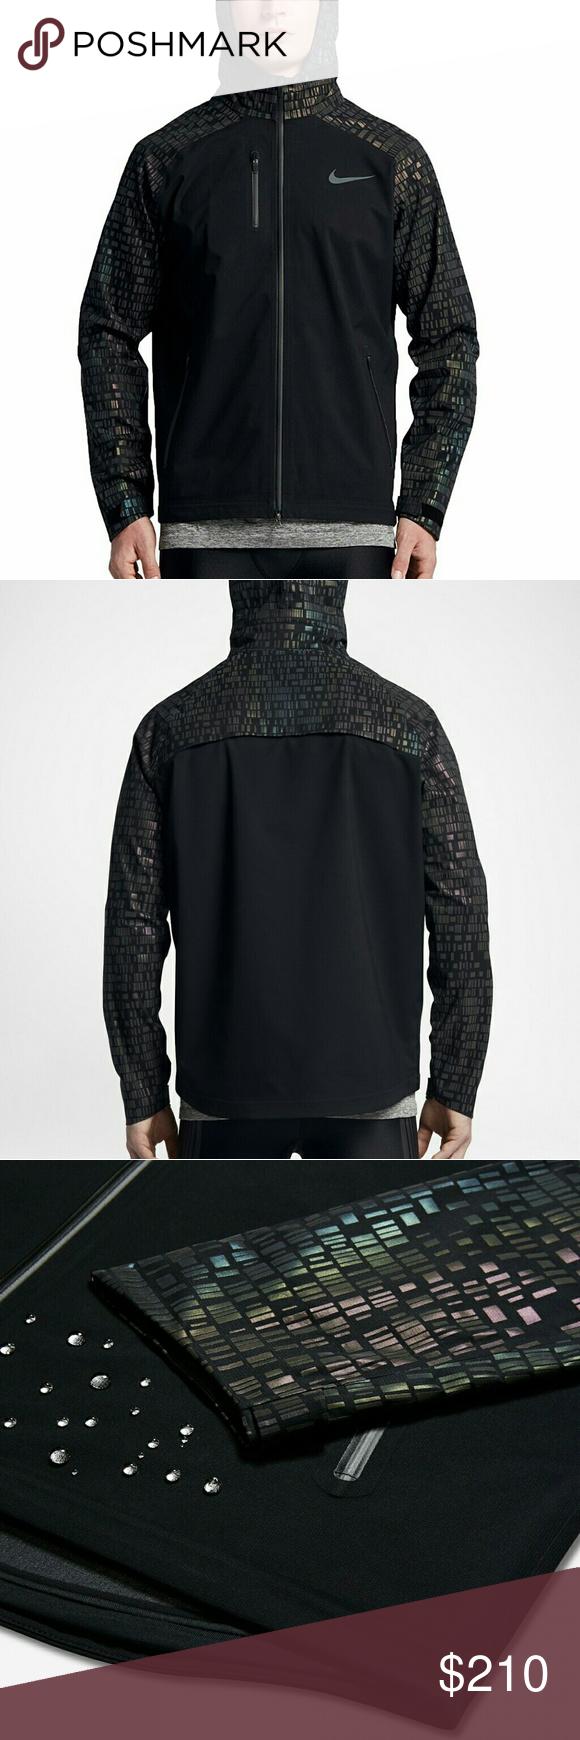 NIKE HYPERSHIELD FLASH Running Jacket 800903 010 Size Xl New